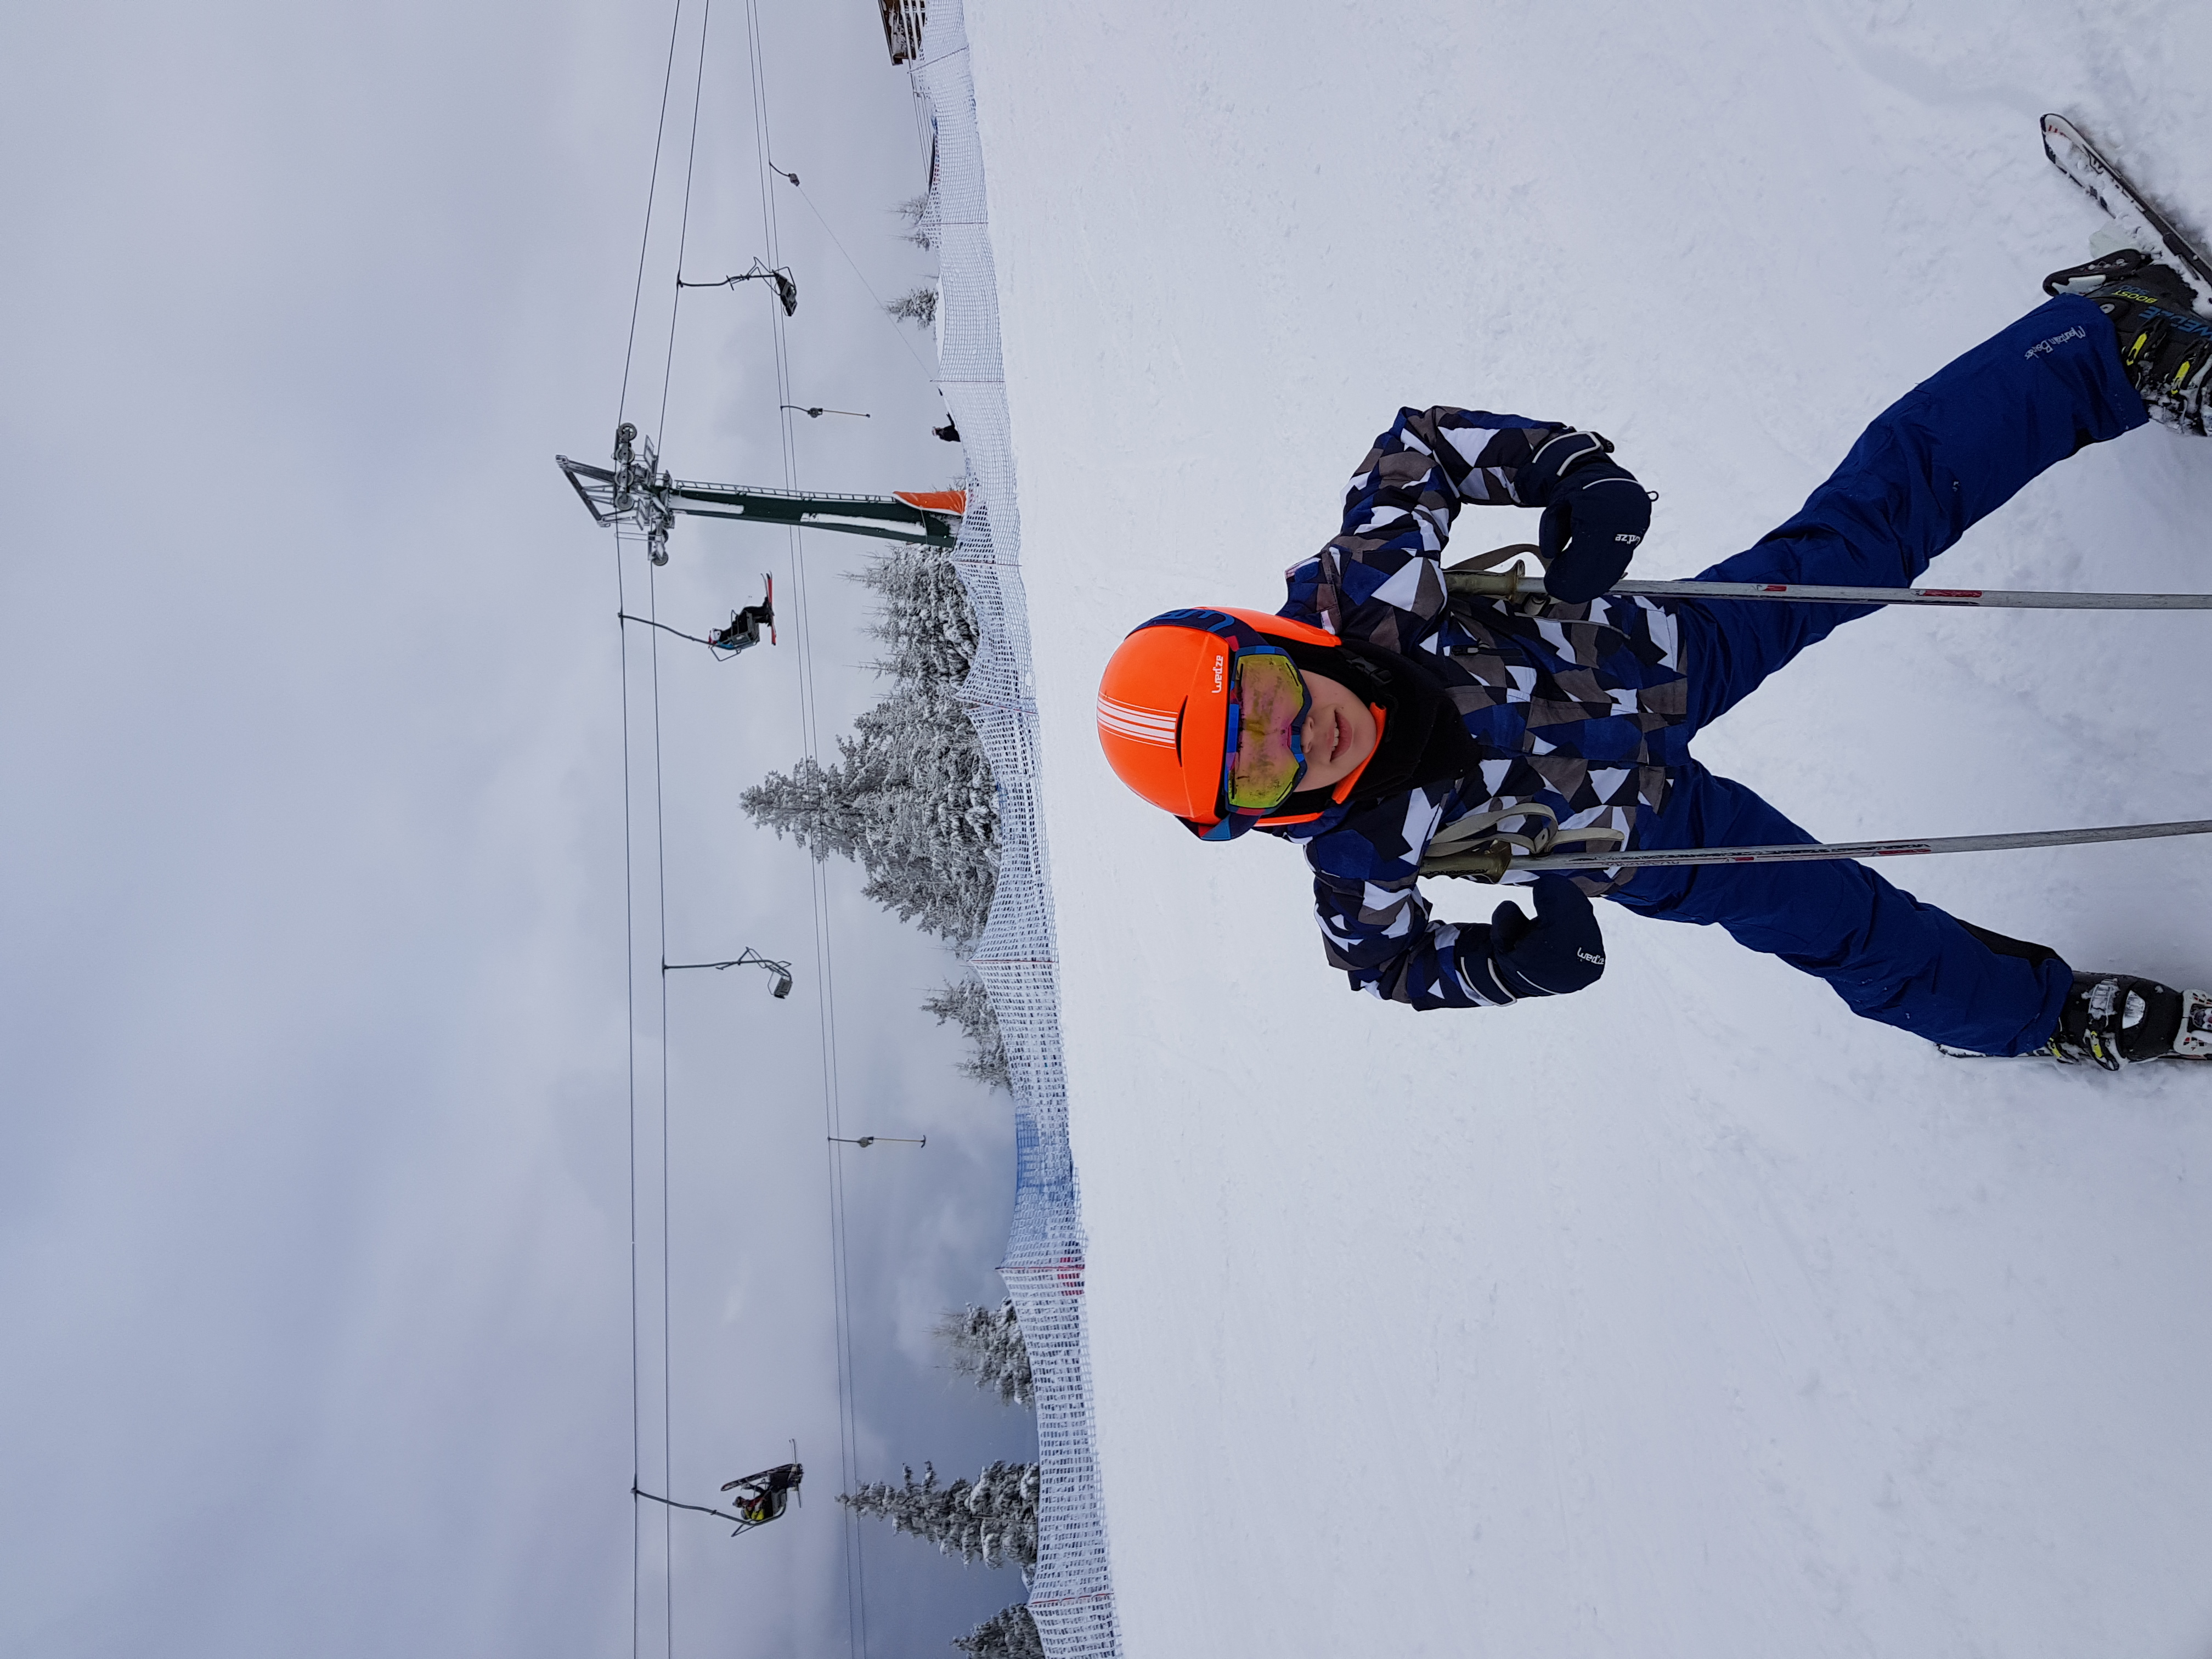 Instructor ski Arena Platos